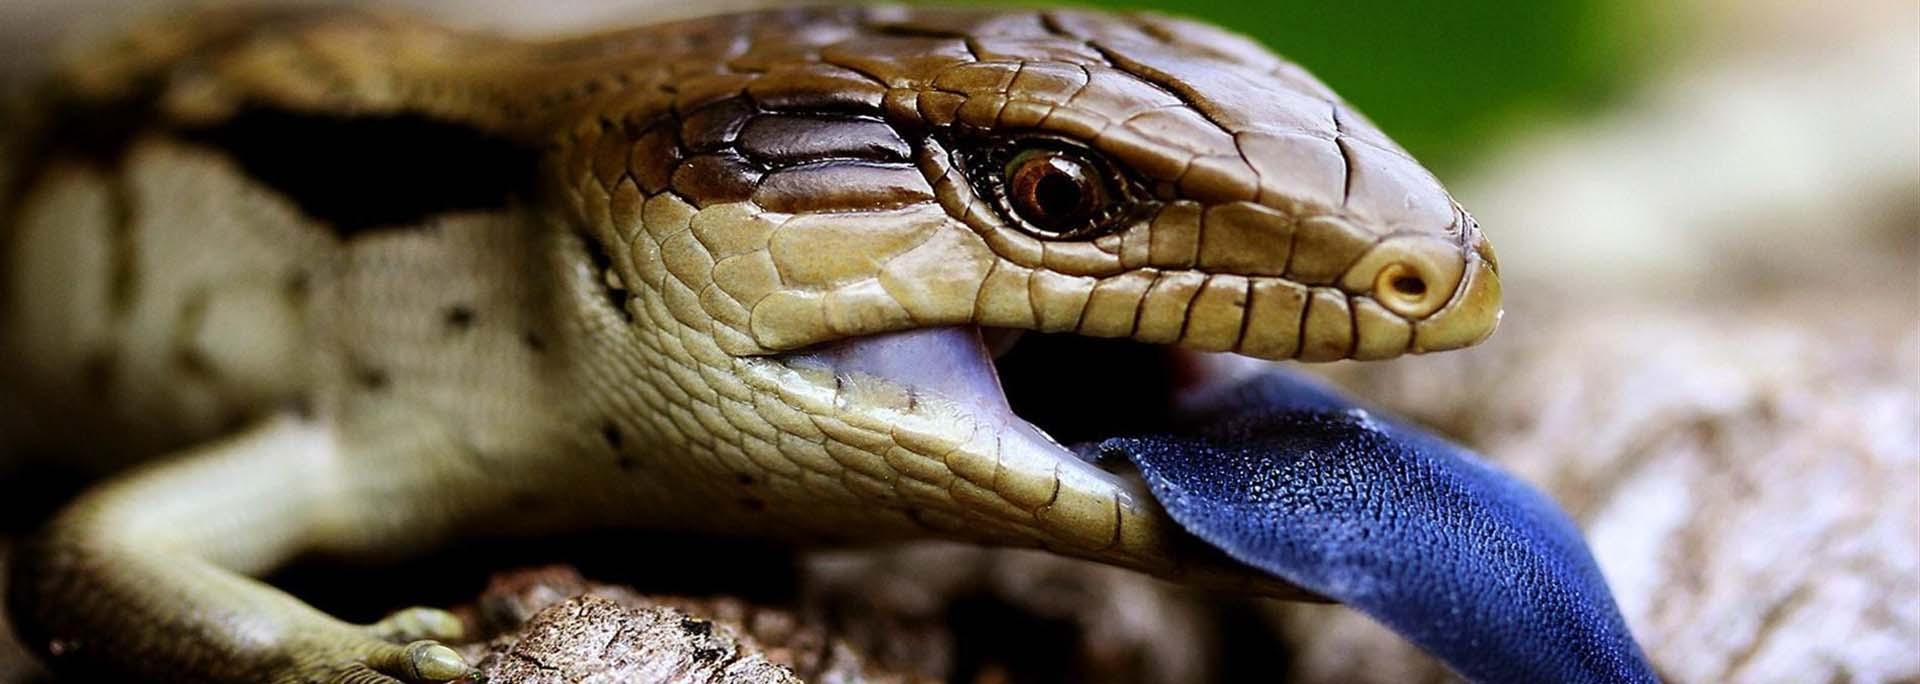 slider-reptiles-online-3